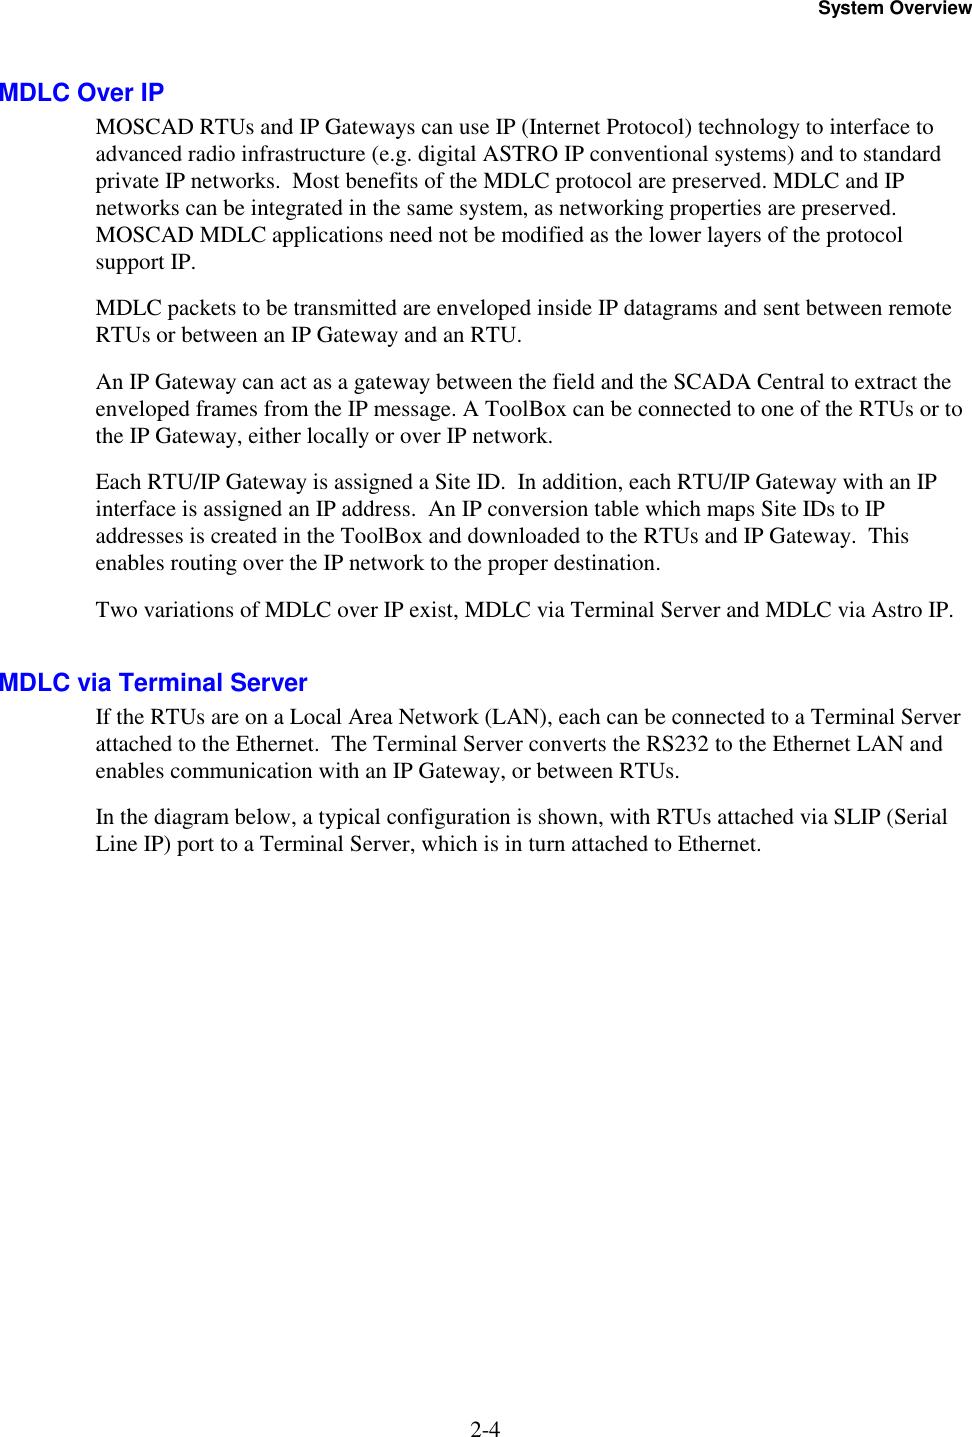 Motorola 68P02958C00 B Users Manual ToolBox For MOSCAD™ IP